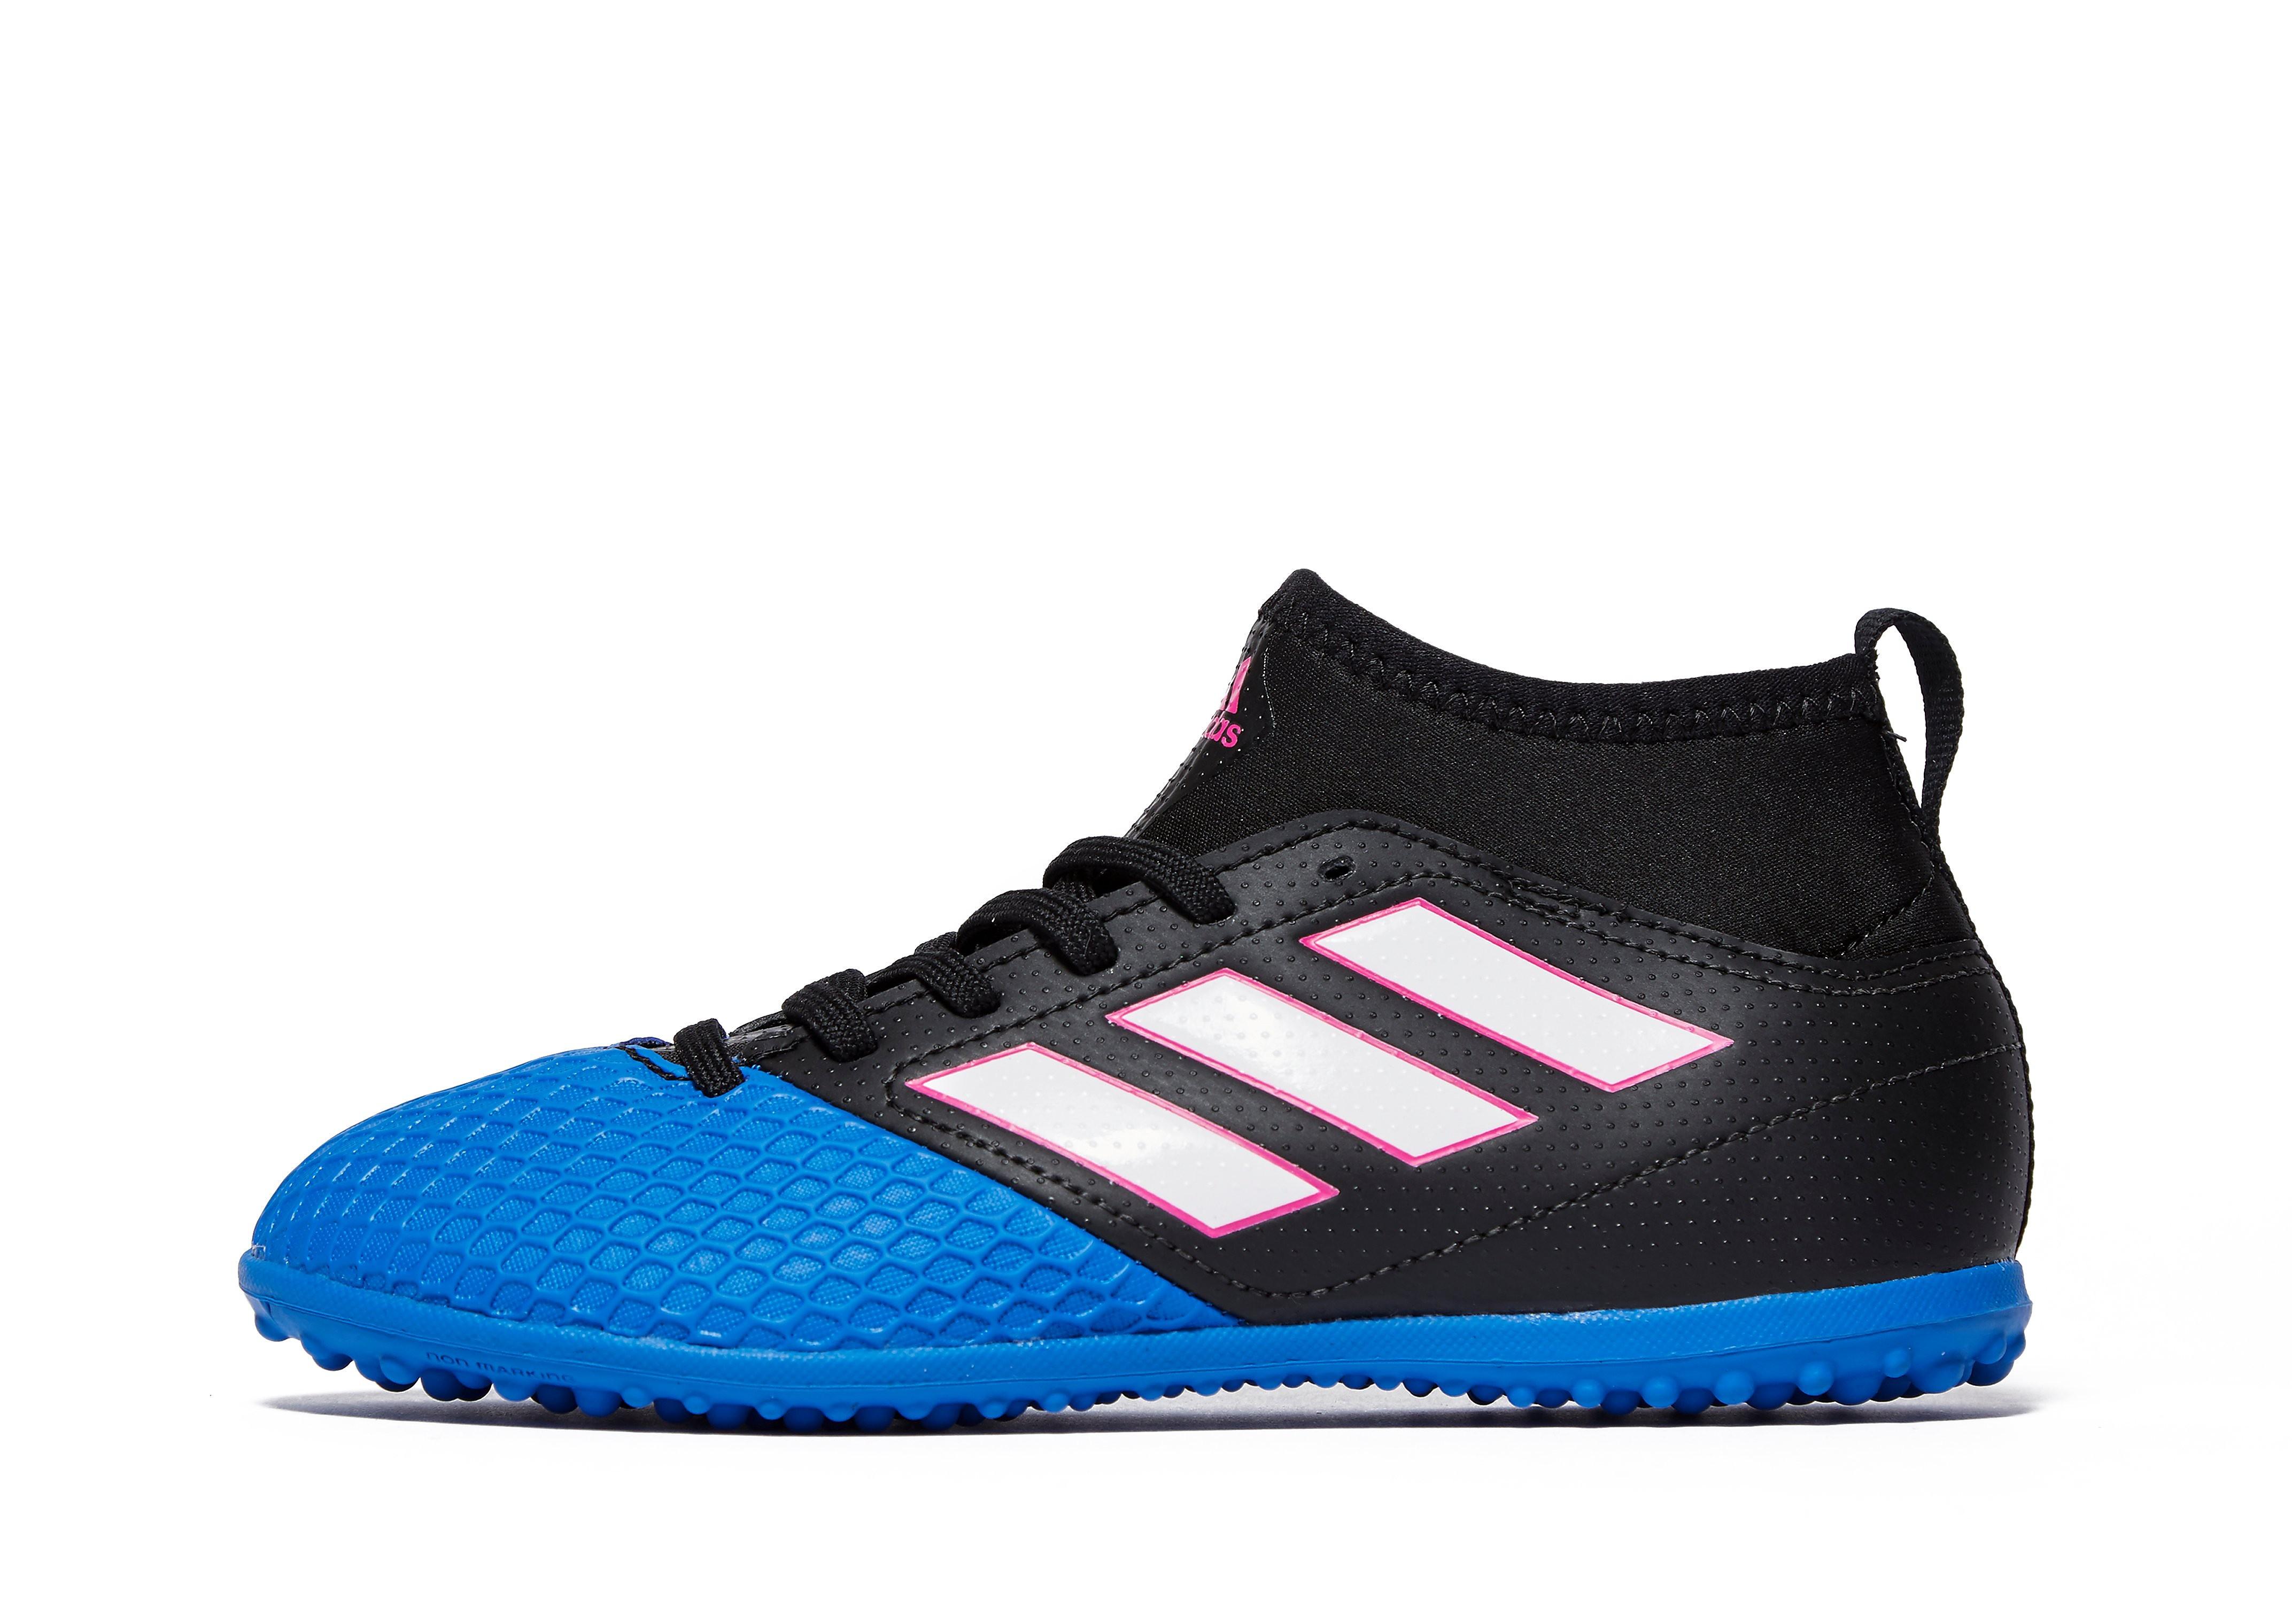 Image de adidas Blue Blast Ace 17.3 Turf Enfant - Blue/Black